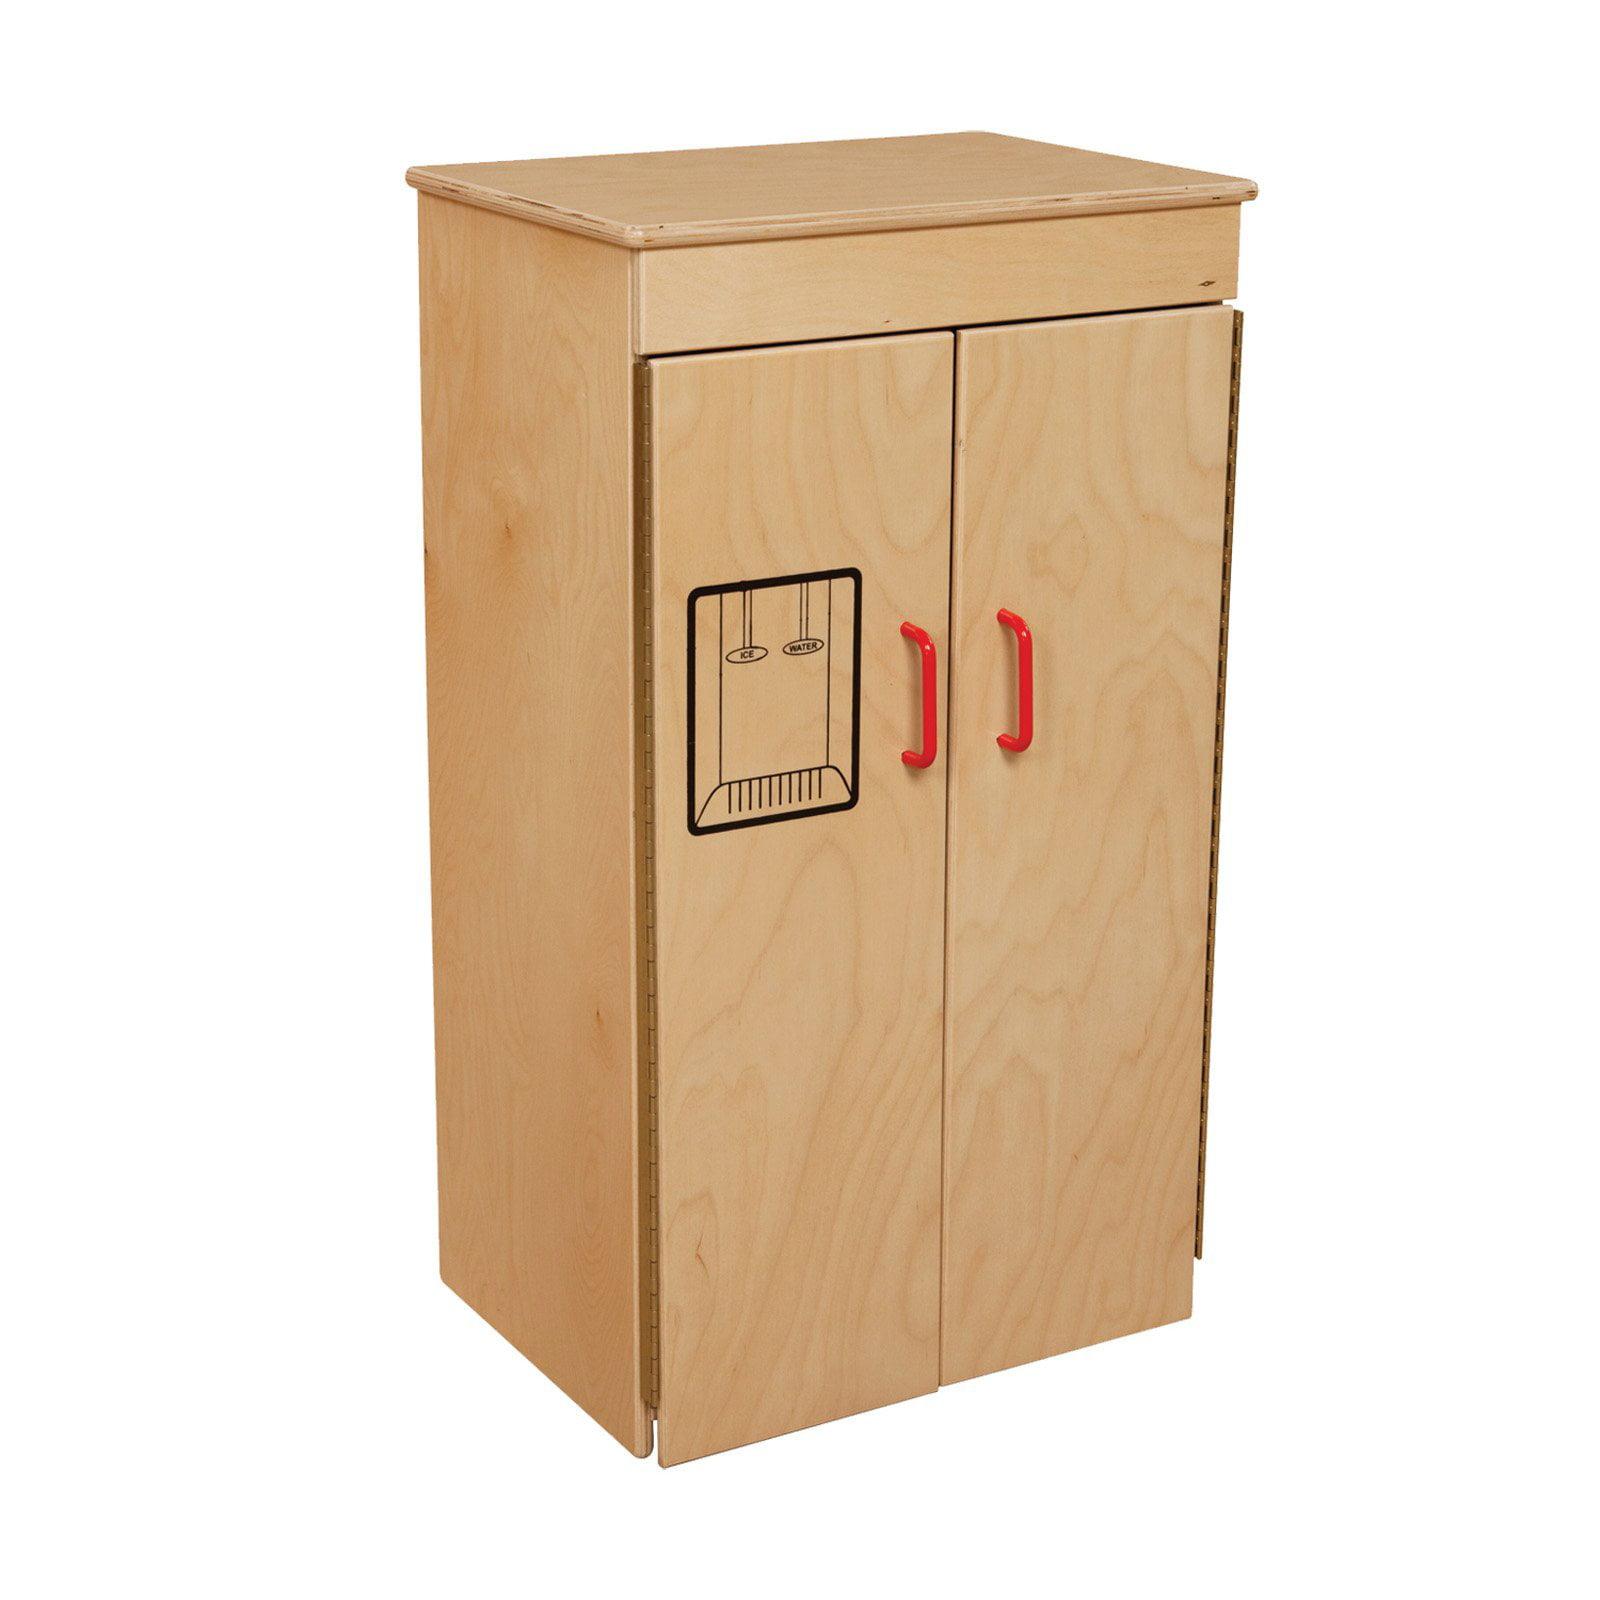 Wood Designs Play Refrigerator - Natural